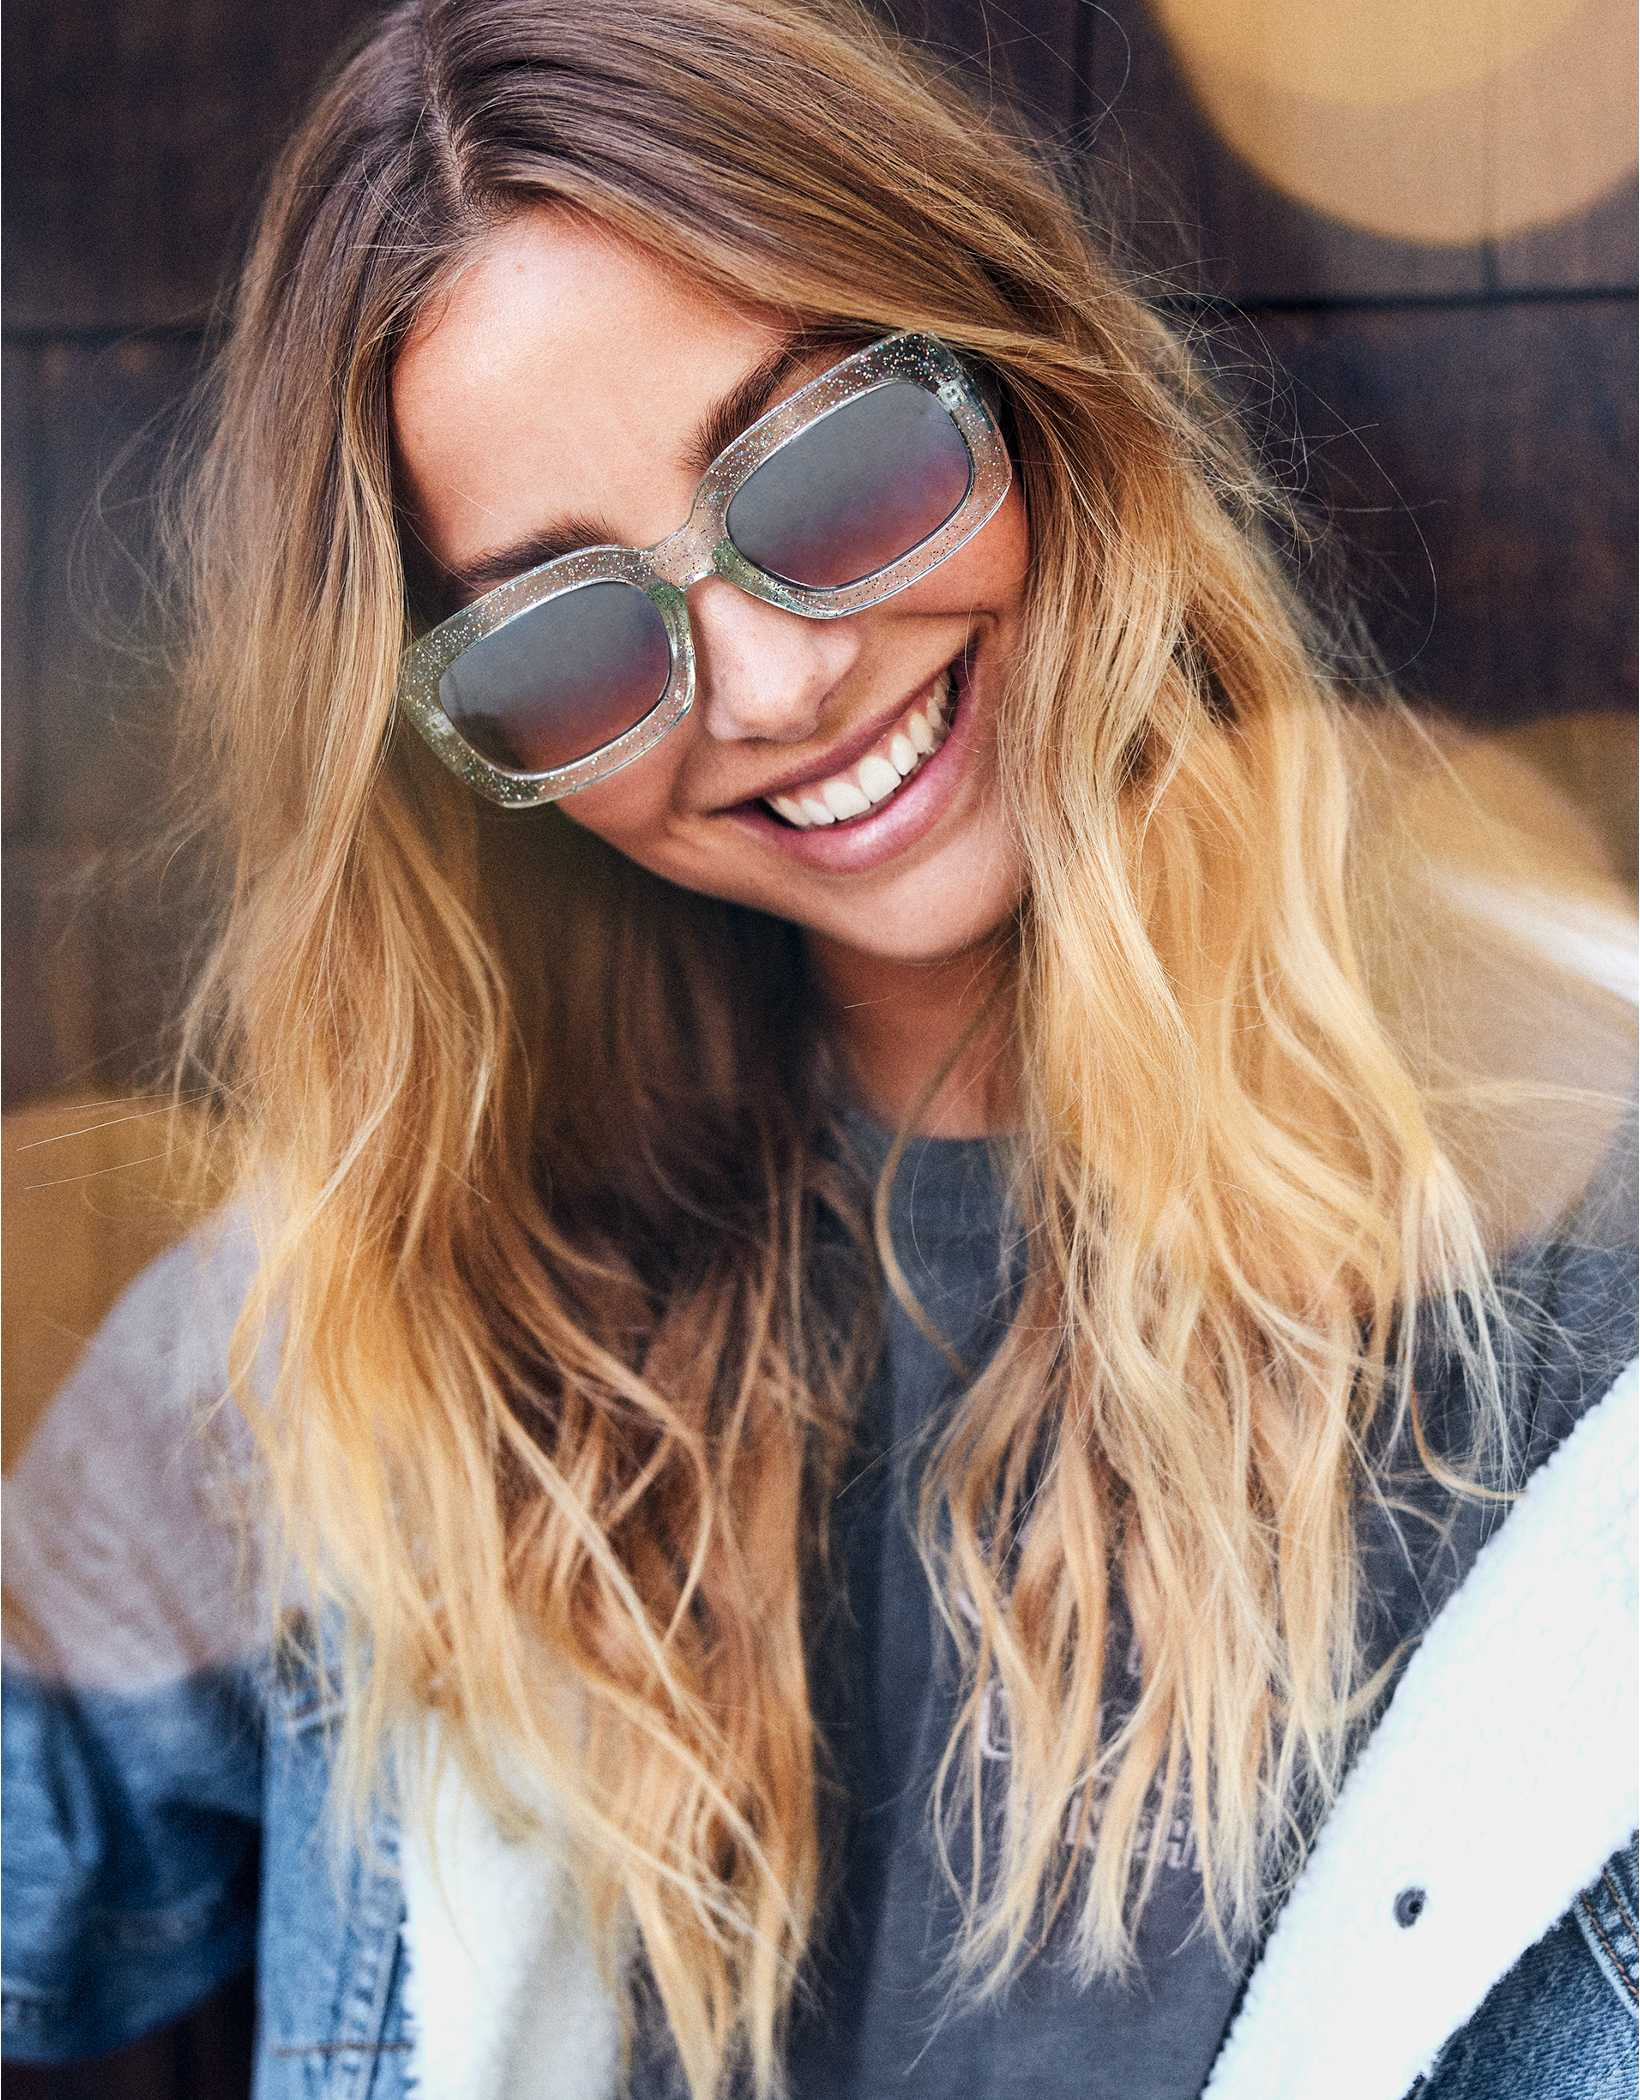 Aerie Bright Side Sunglasses